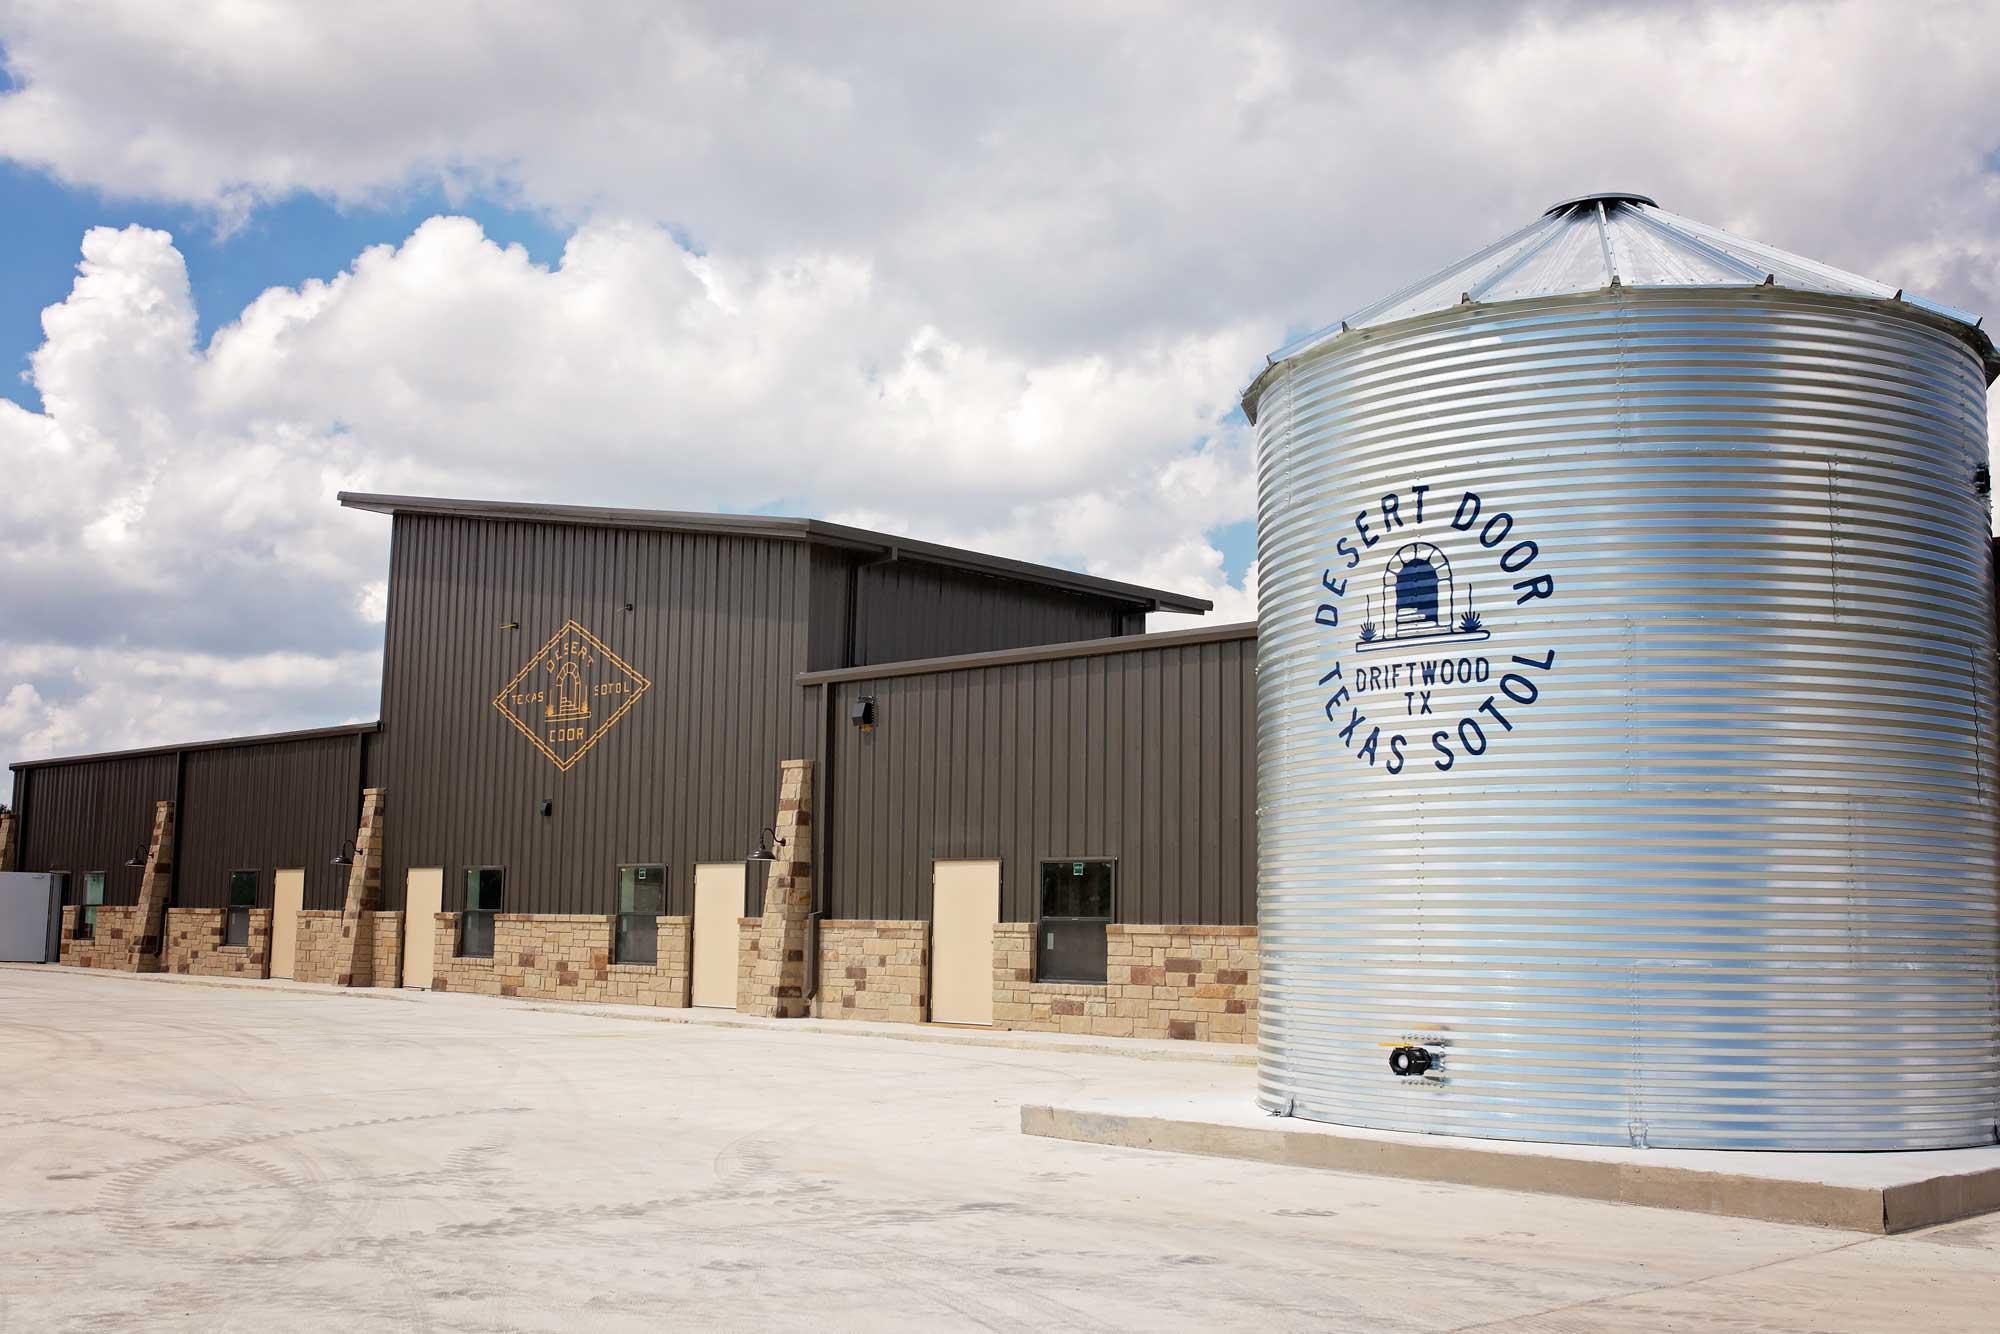 Desert Door, the liquor brand started by three veterans